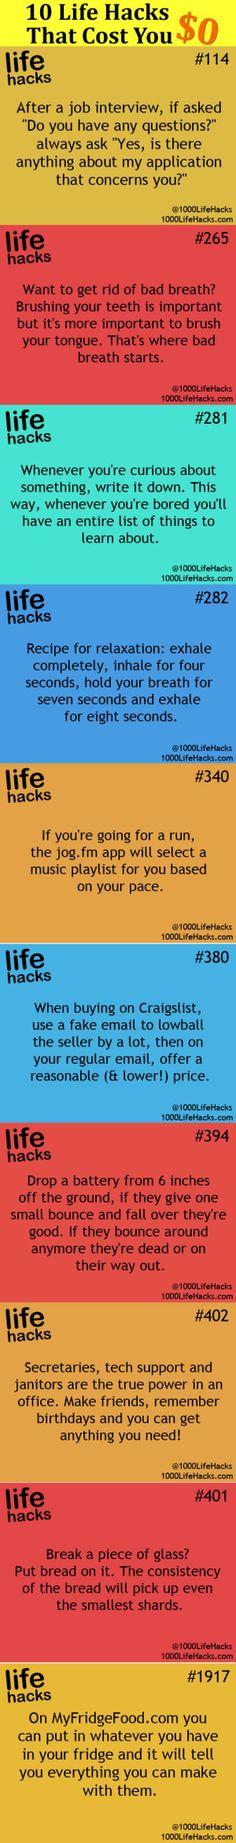 life-hacks-financial-saving-money